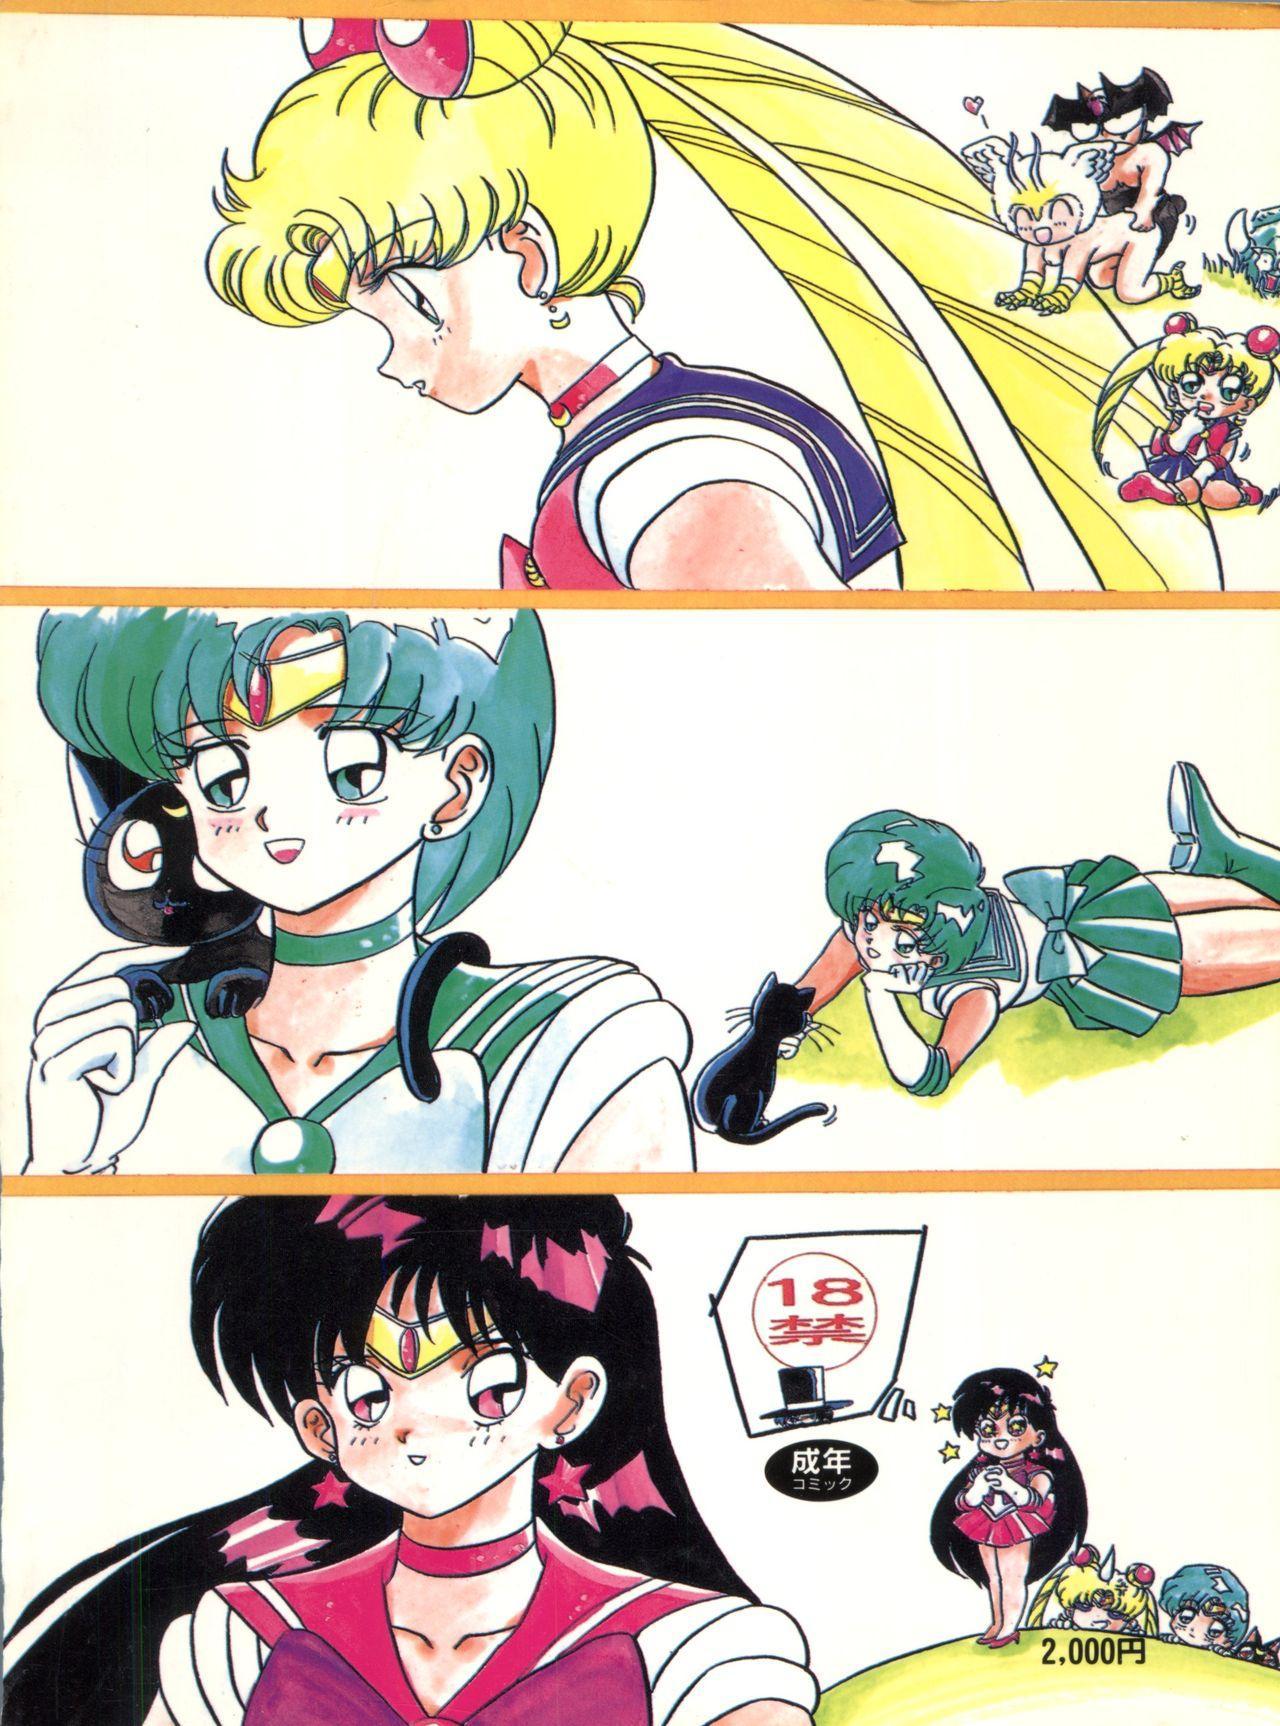 [Global One (MARO)] Sadistic 5 (Cutey Honey, Devilman, Sailor Moon), [Global One (MARO)] Sadistic (Dirty Pair, Fushigi no Umi no Nadia, Sailor Moon), [Studio Ikkatsumajin] .ribbon (Hime-chan's Ribbon) 155